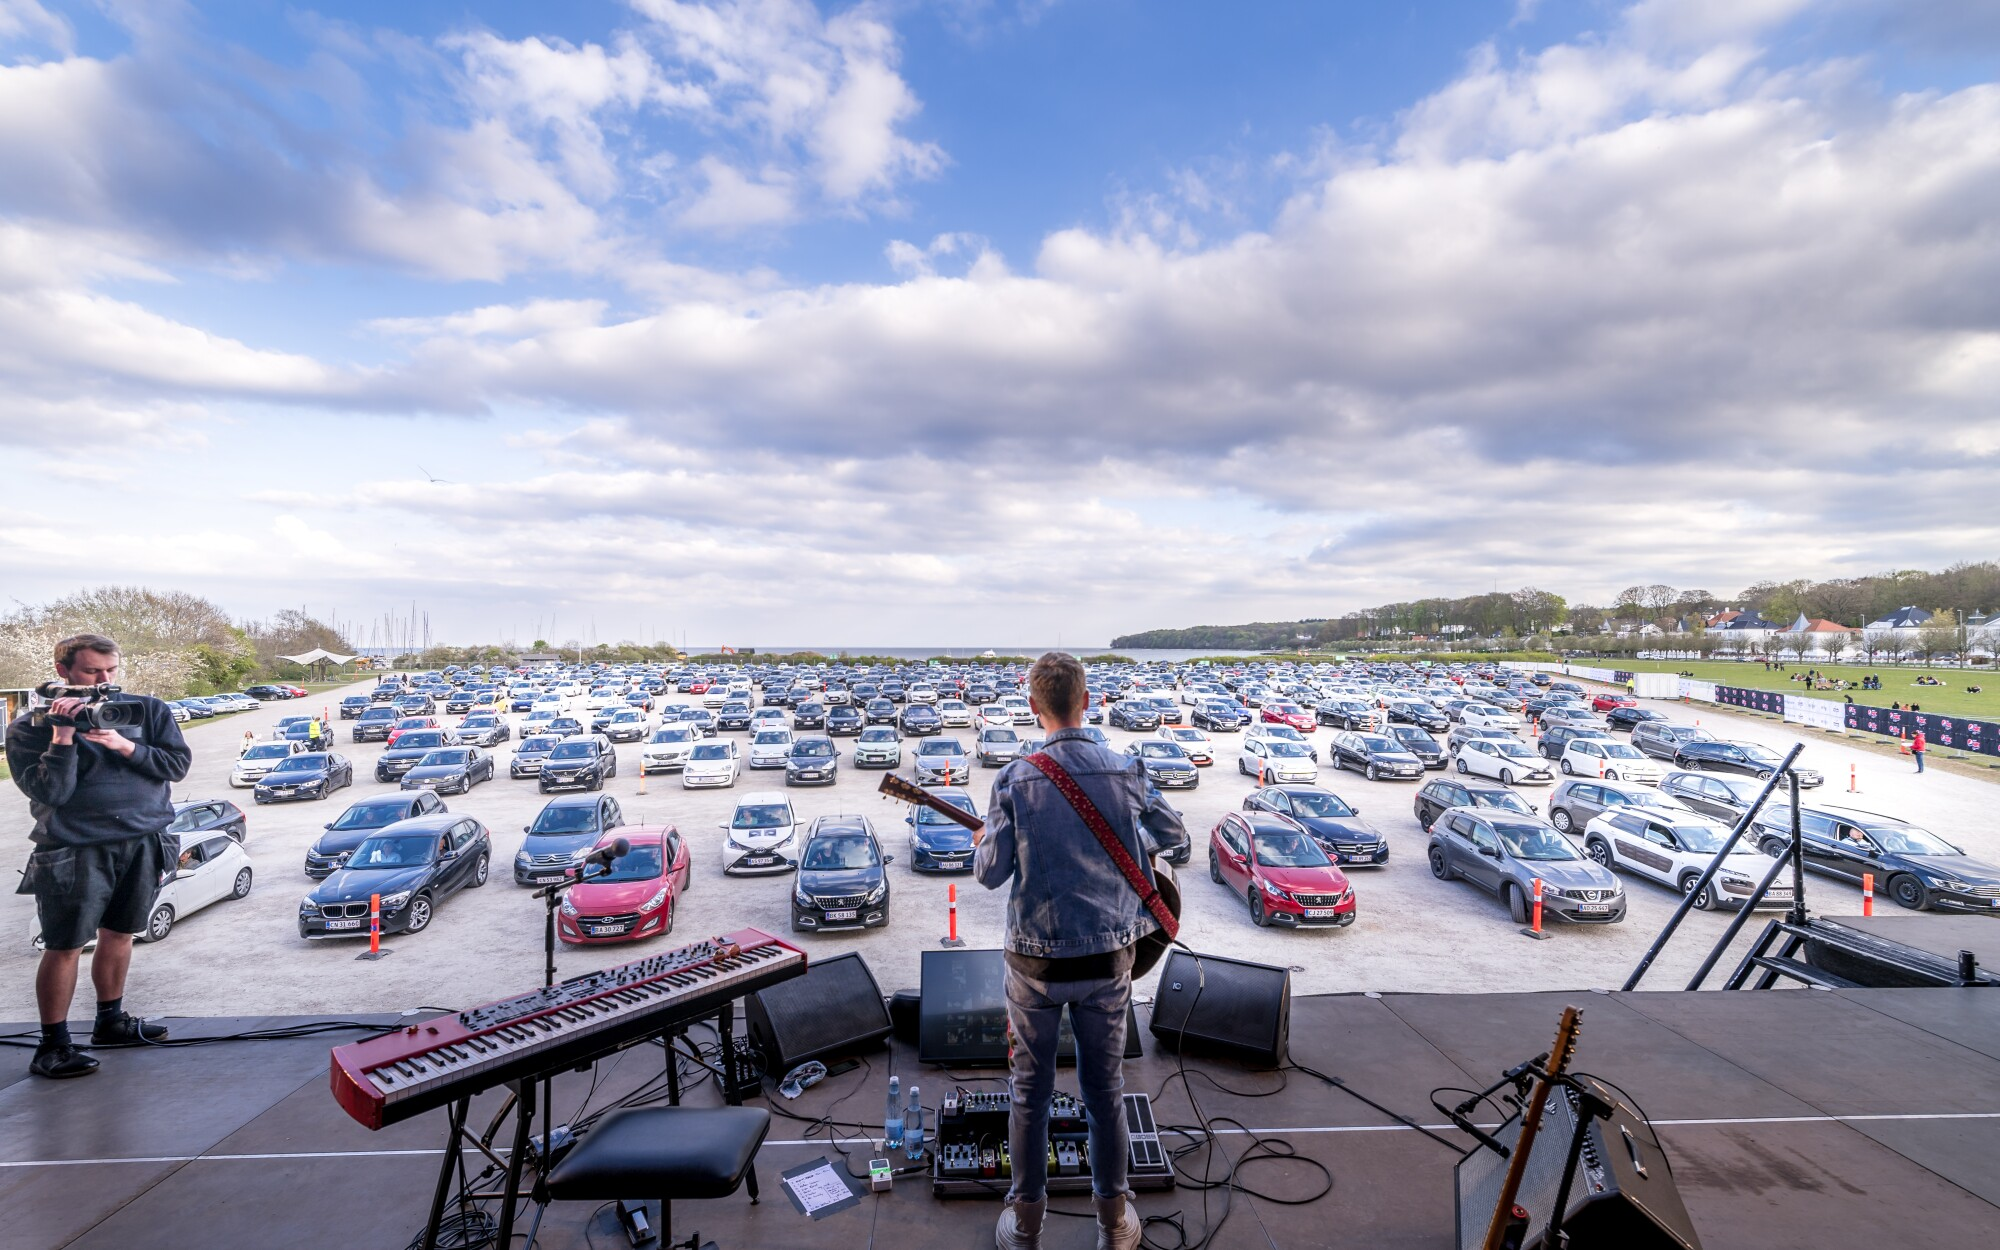 Singer-songwriter Mads Langer is shown performing a drive-in concert in Aarhus, Denmark.